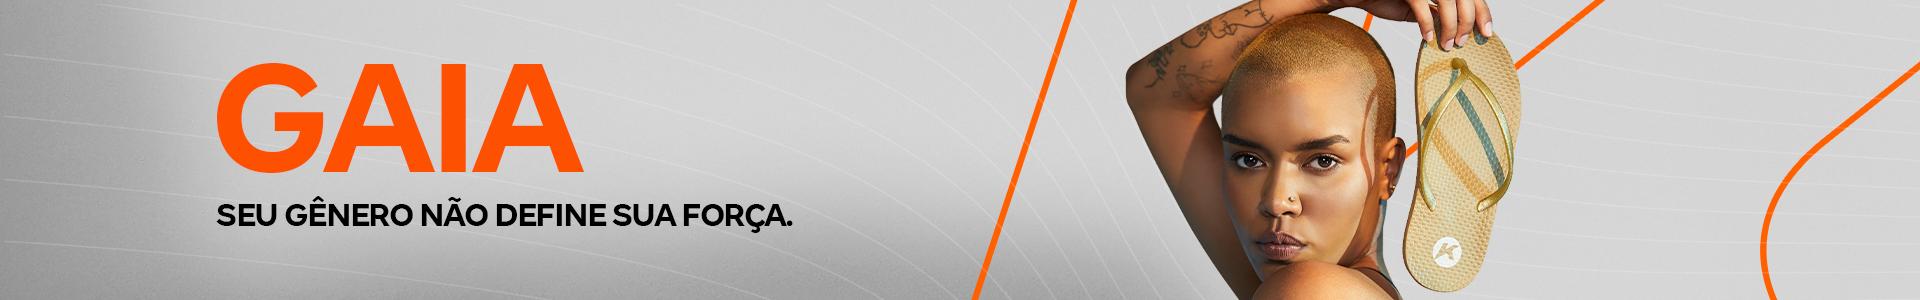 banner-desktop-gaia